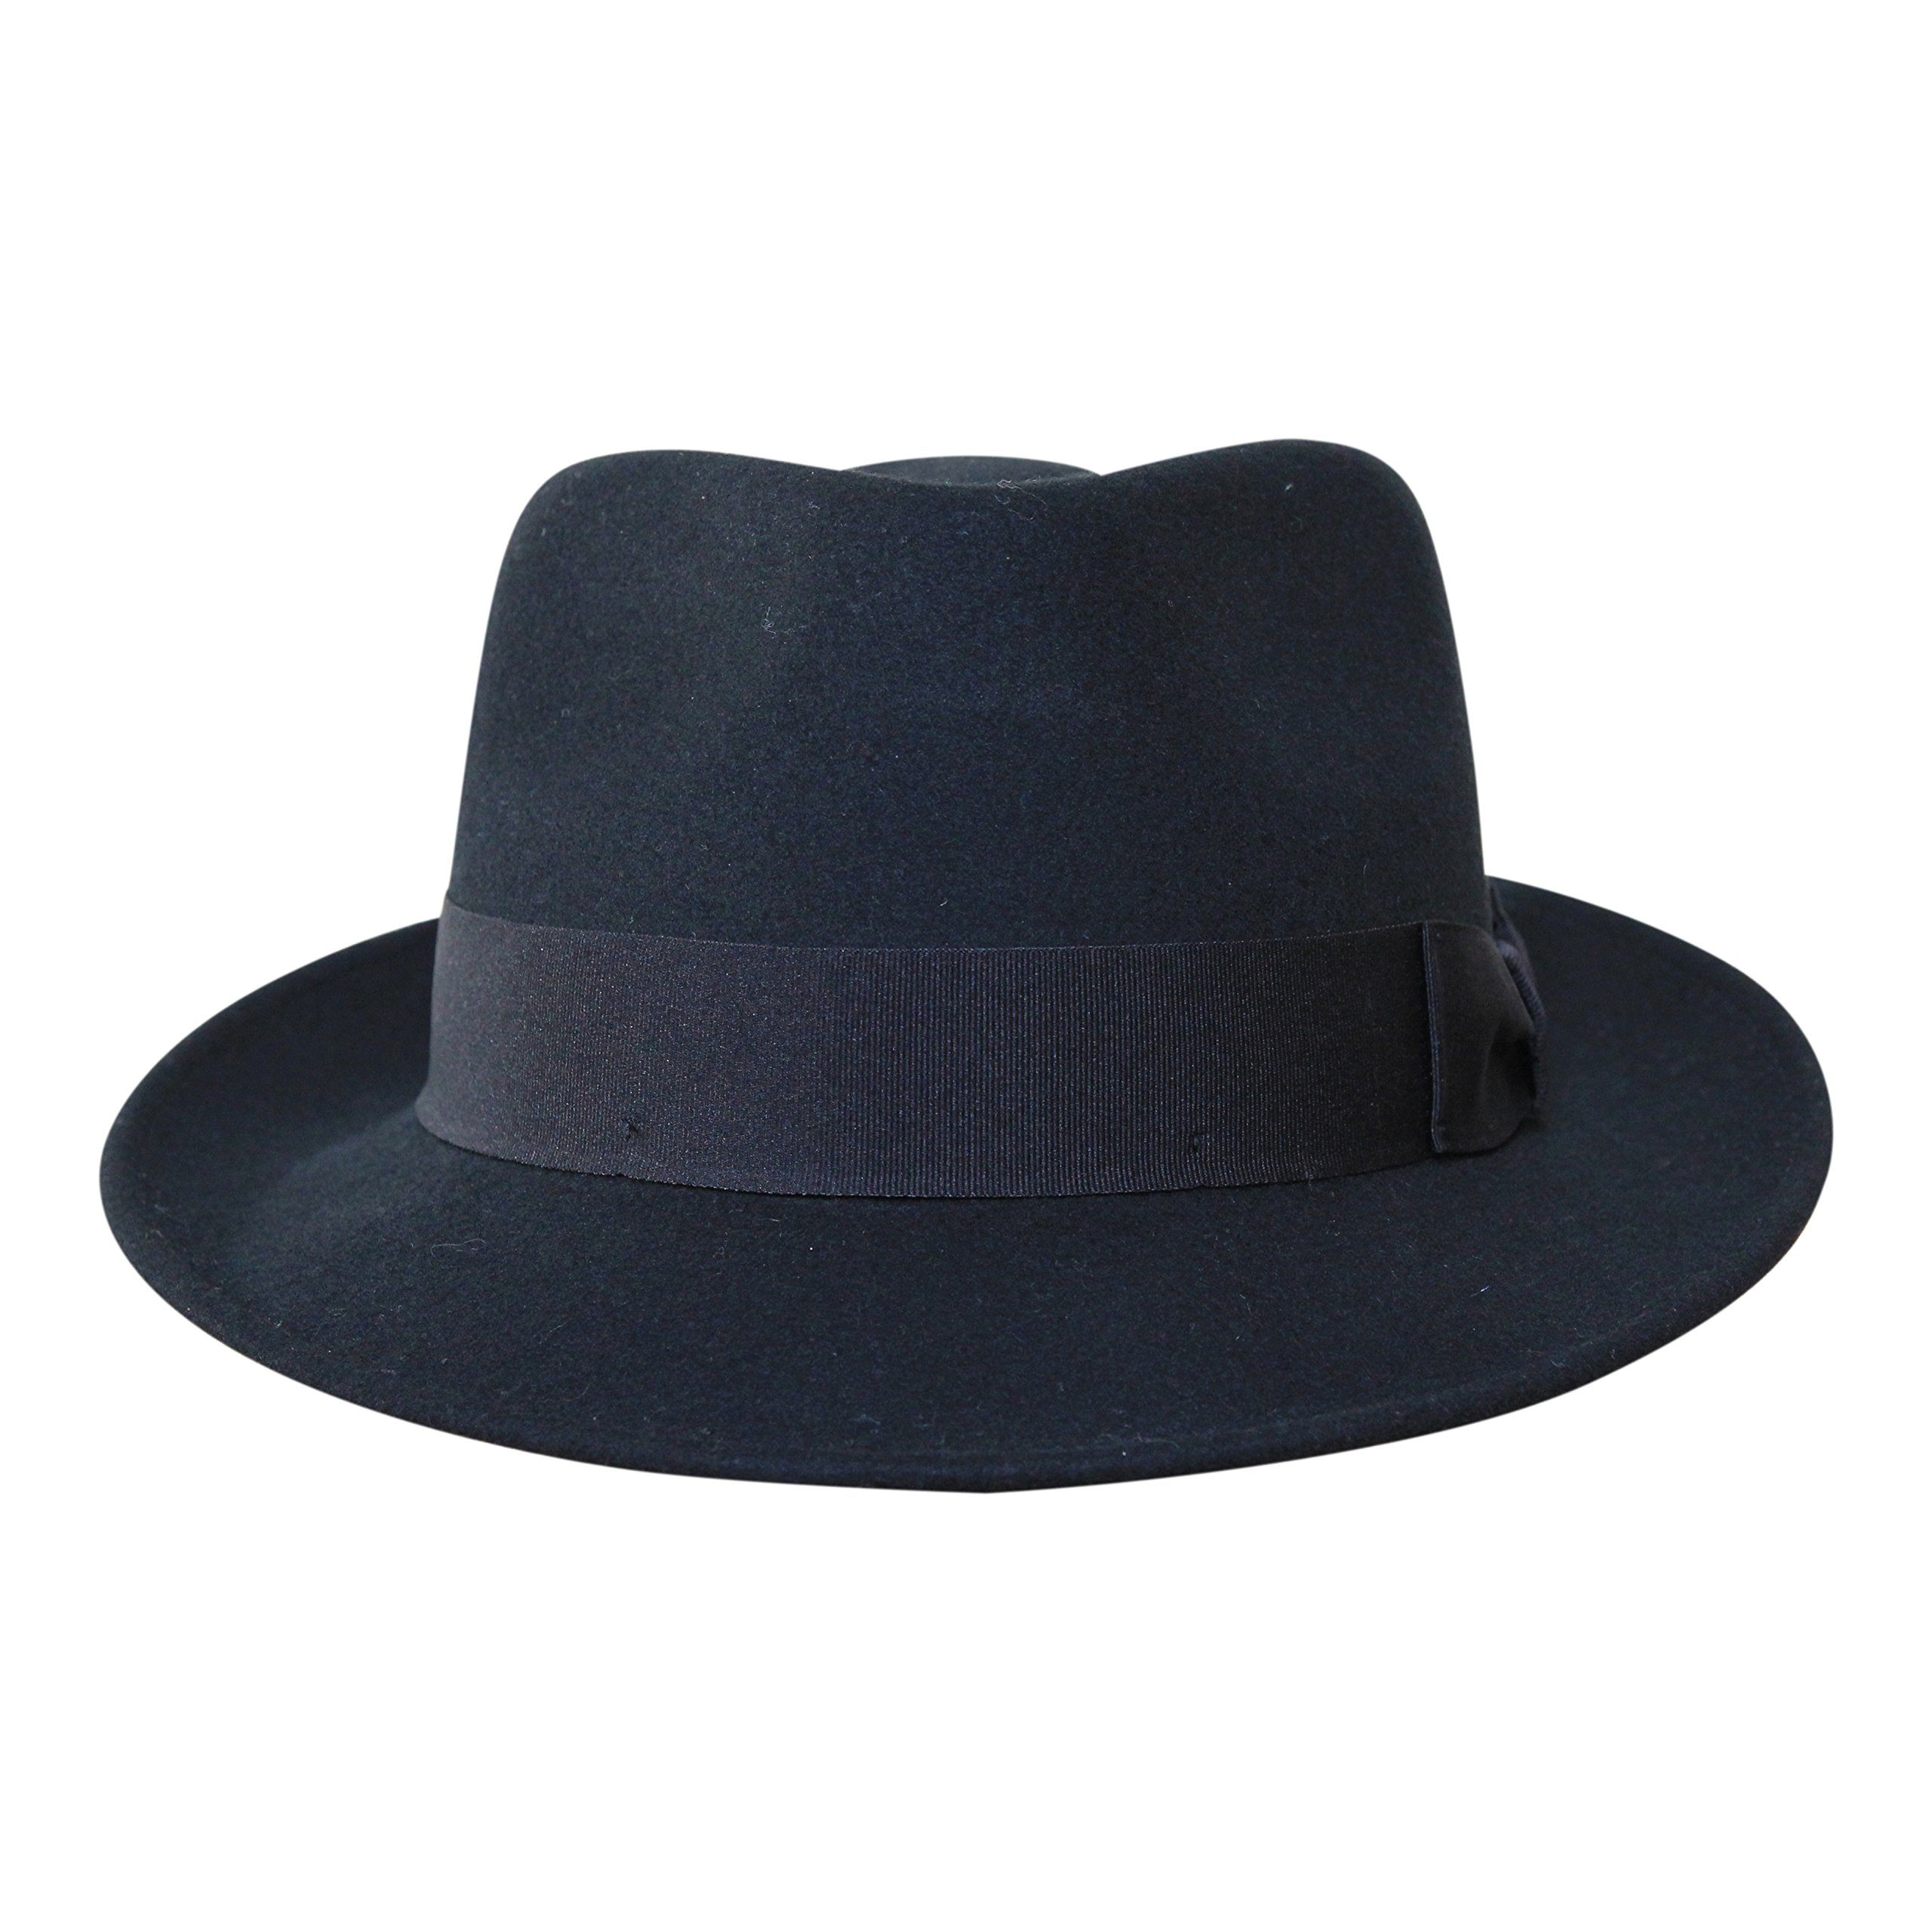 1a4c91d36 B&S Premium Doyle - Teardrop Fedora Hat - 100% Wool Felt - Crushable For  Travel - Water Resistant - Unisex - Black 58